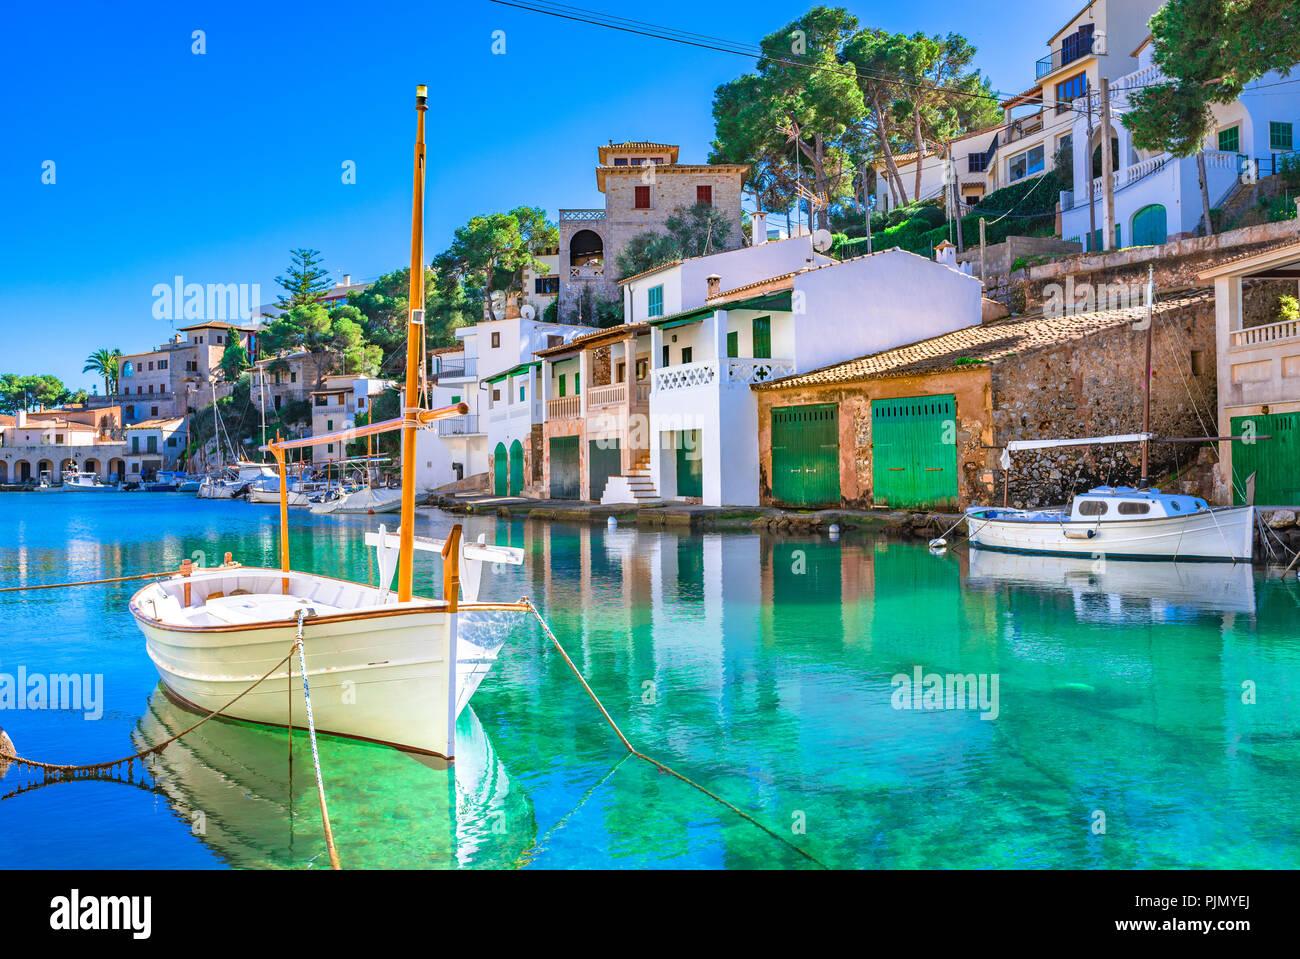 Beautiful view of Cala Figuera, old fishing harbor on Mallorca, Balearic Islands, Spain Mediterranean Sea Stock Photo